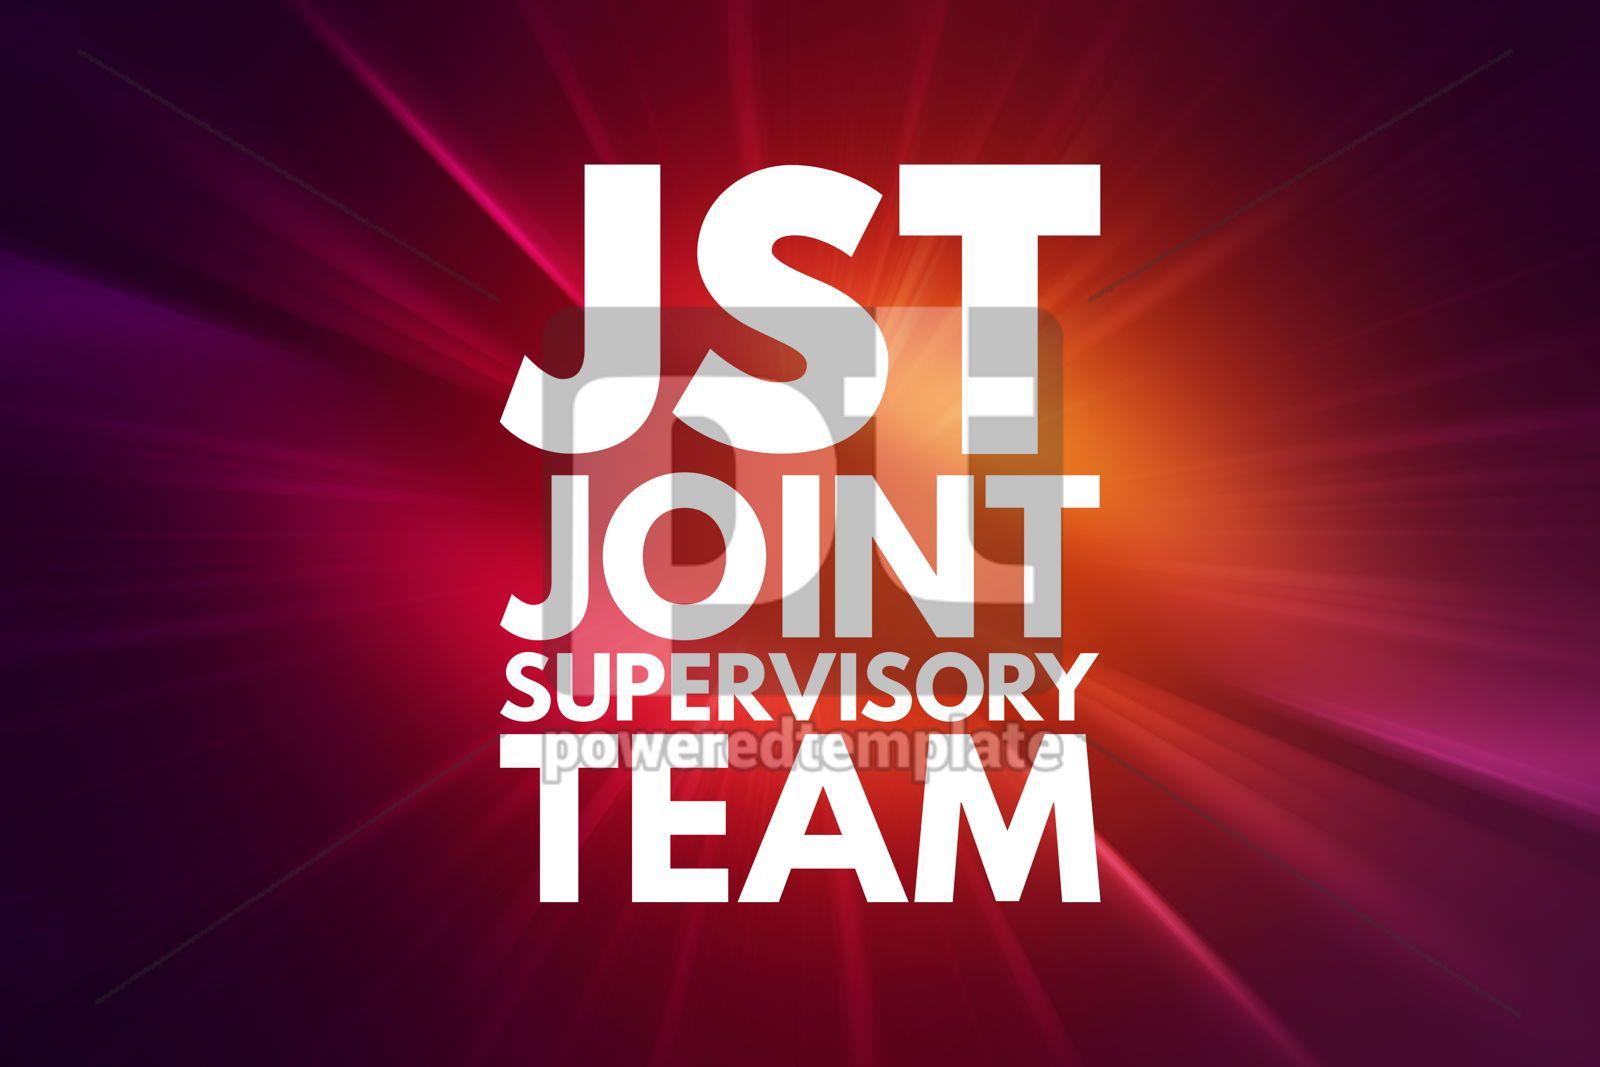 JST - Joint Supervisory Team acronym business concept backgroun, 16544, Business — PoweredTemplate.com